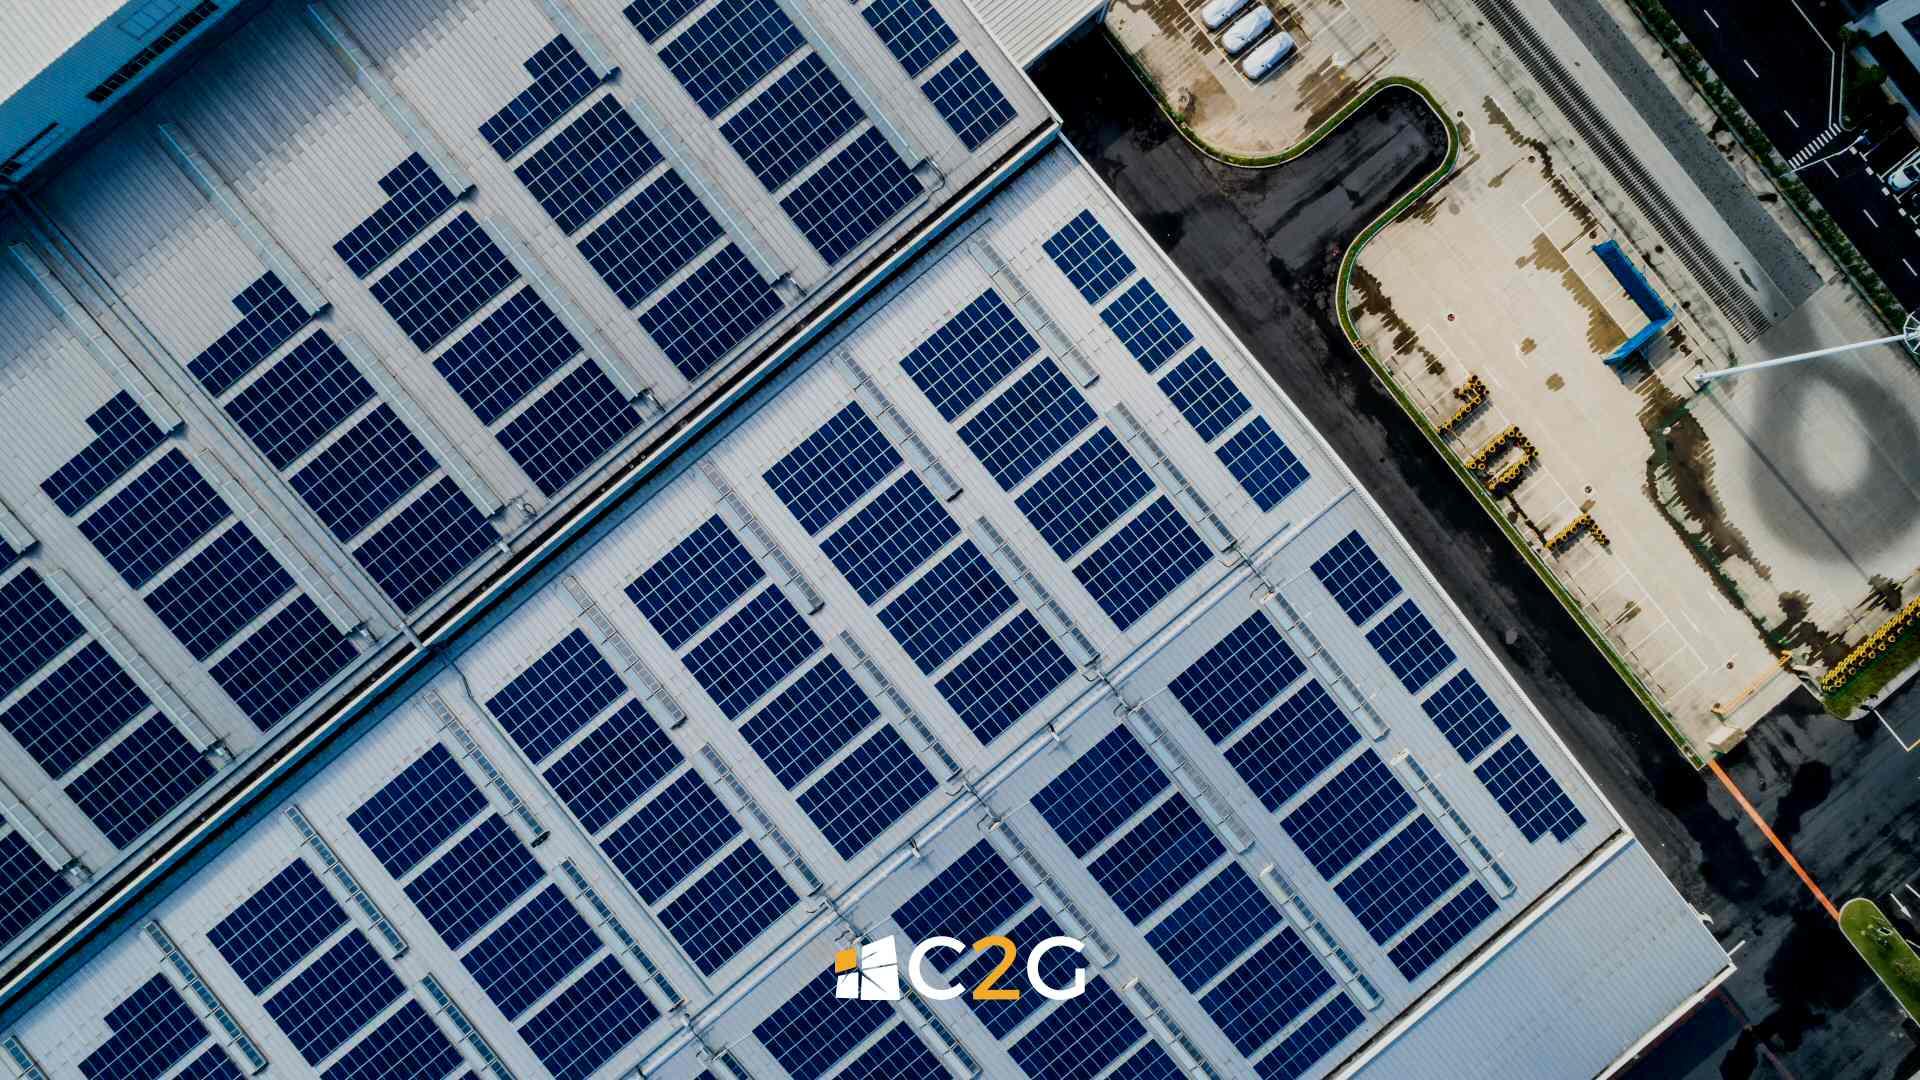 Risparmio energetico azienda - C2G Solar